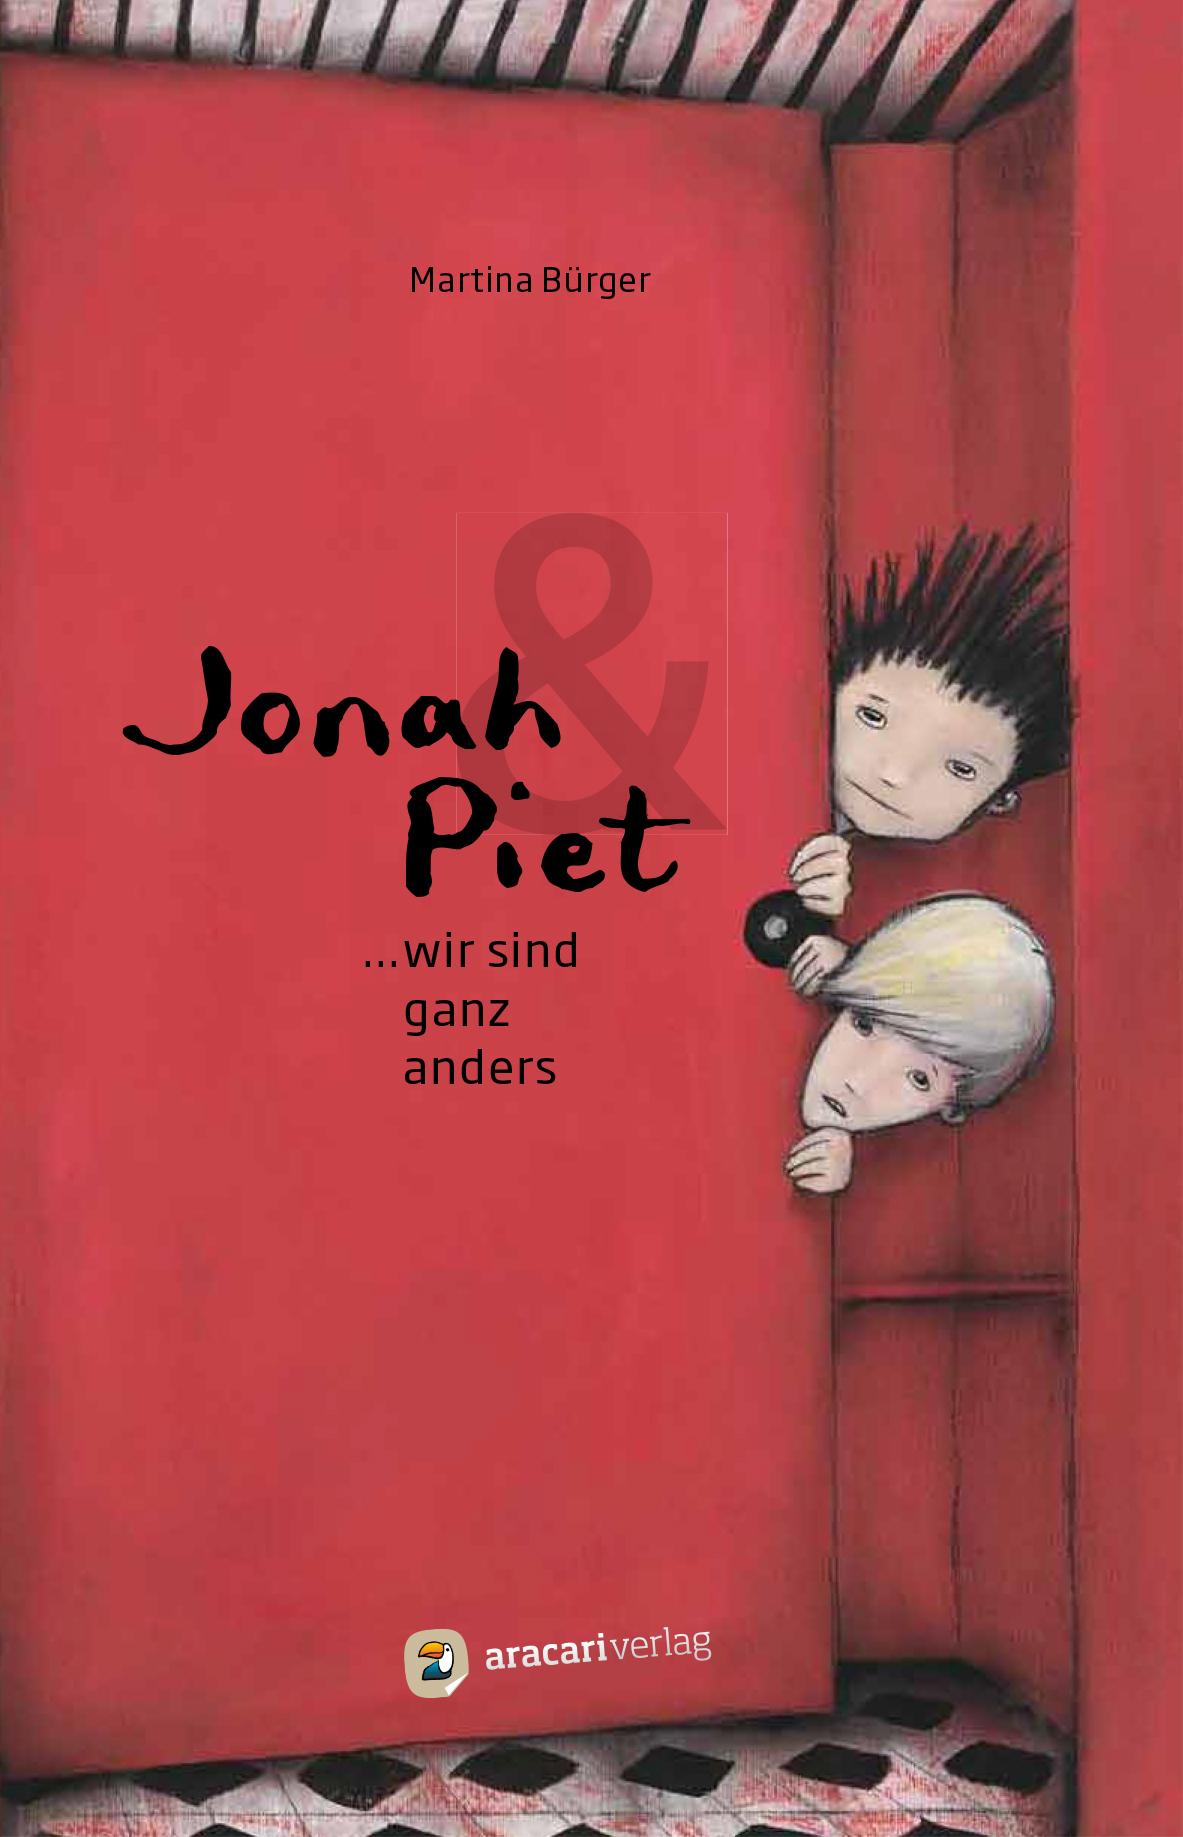 Jonah & Piet – Wir sind ganz anders (Aracari Verlag)